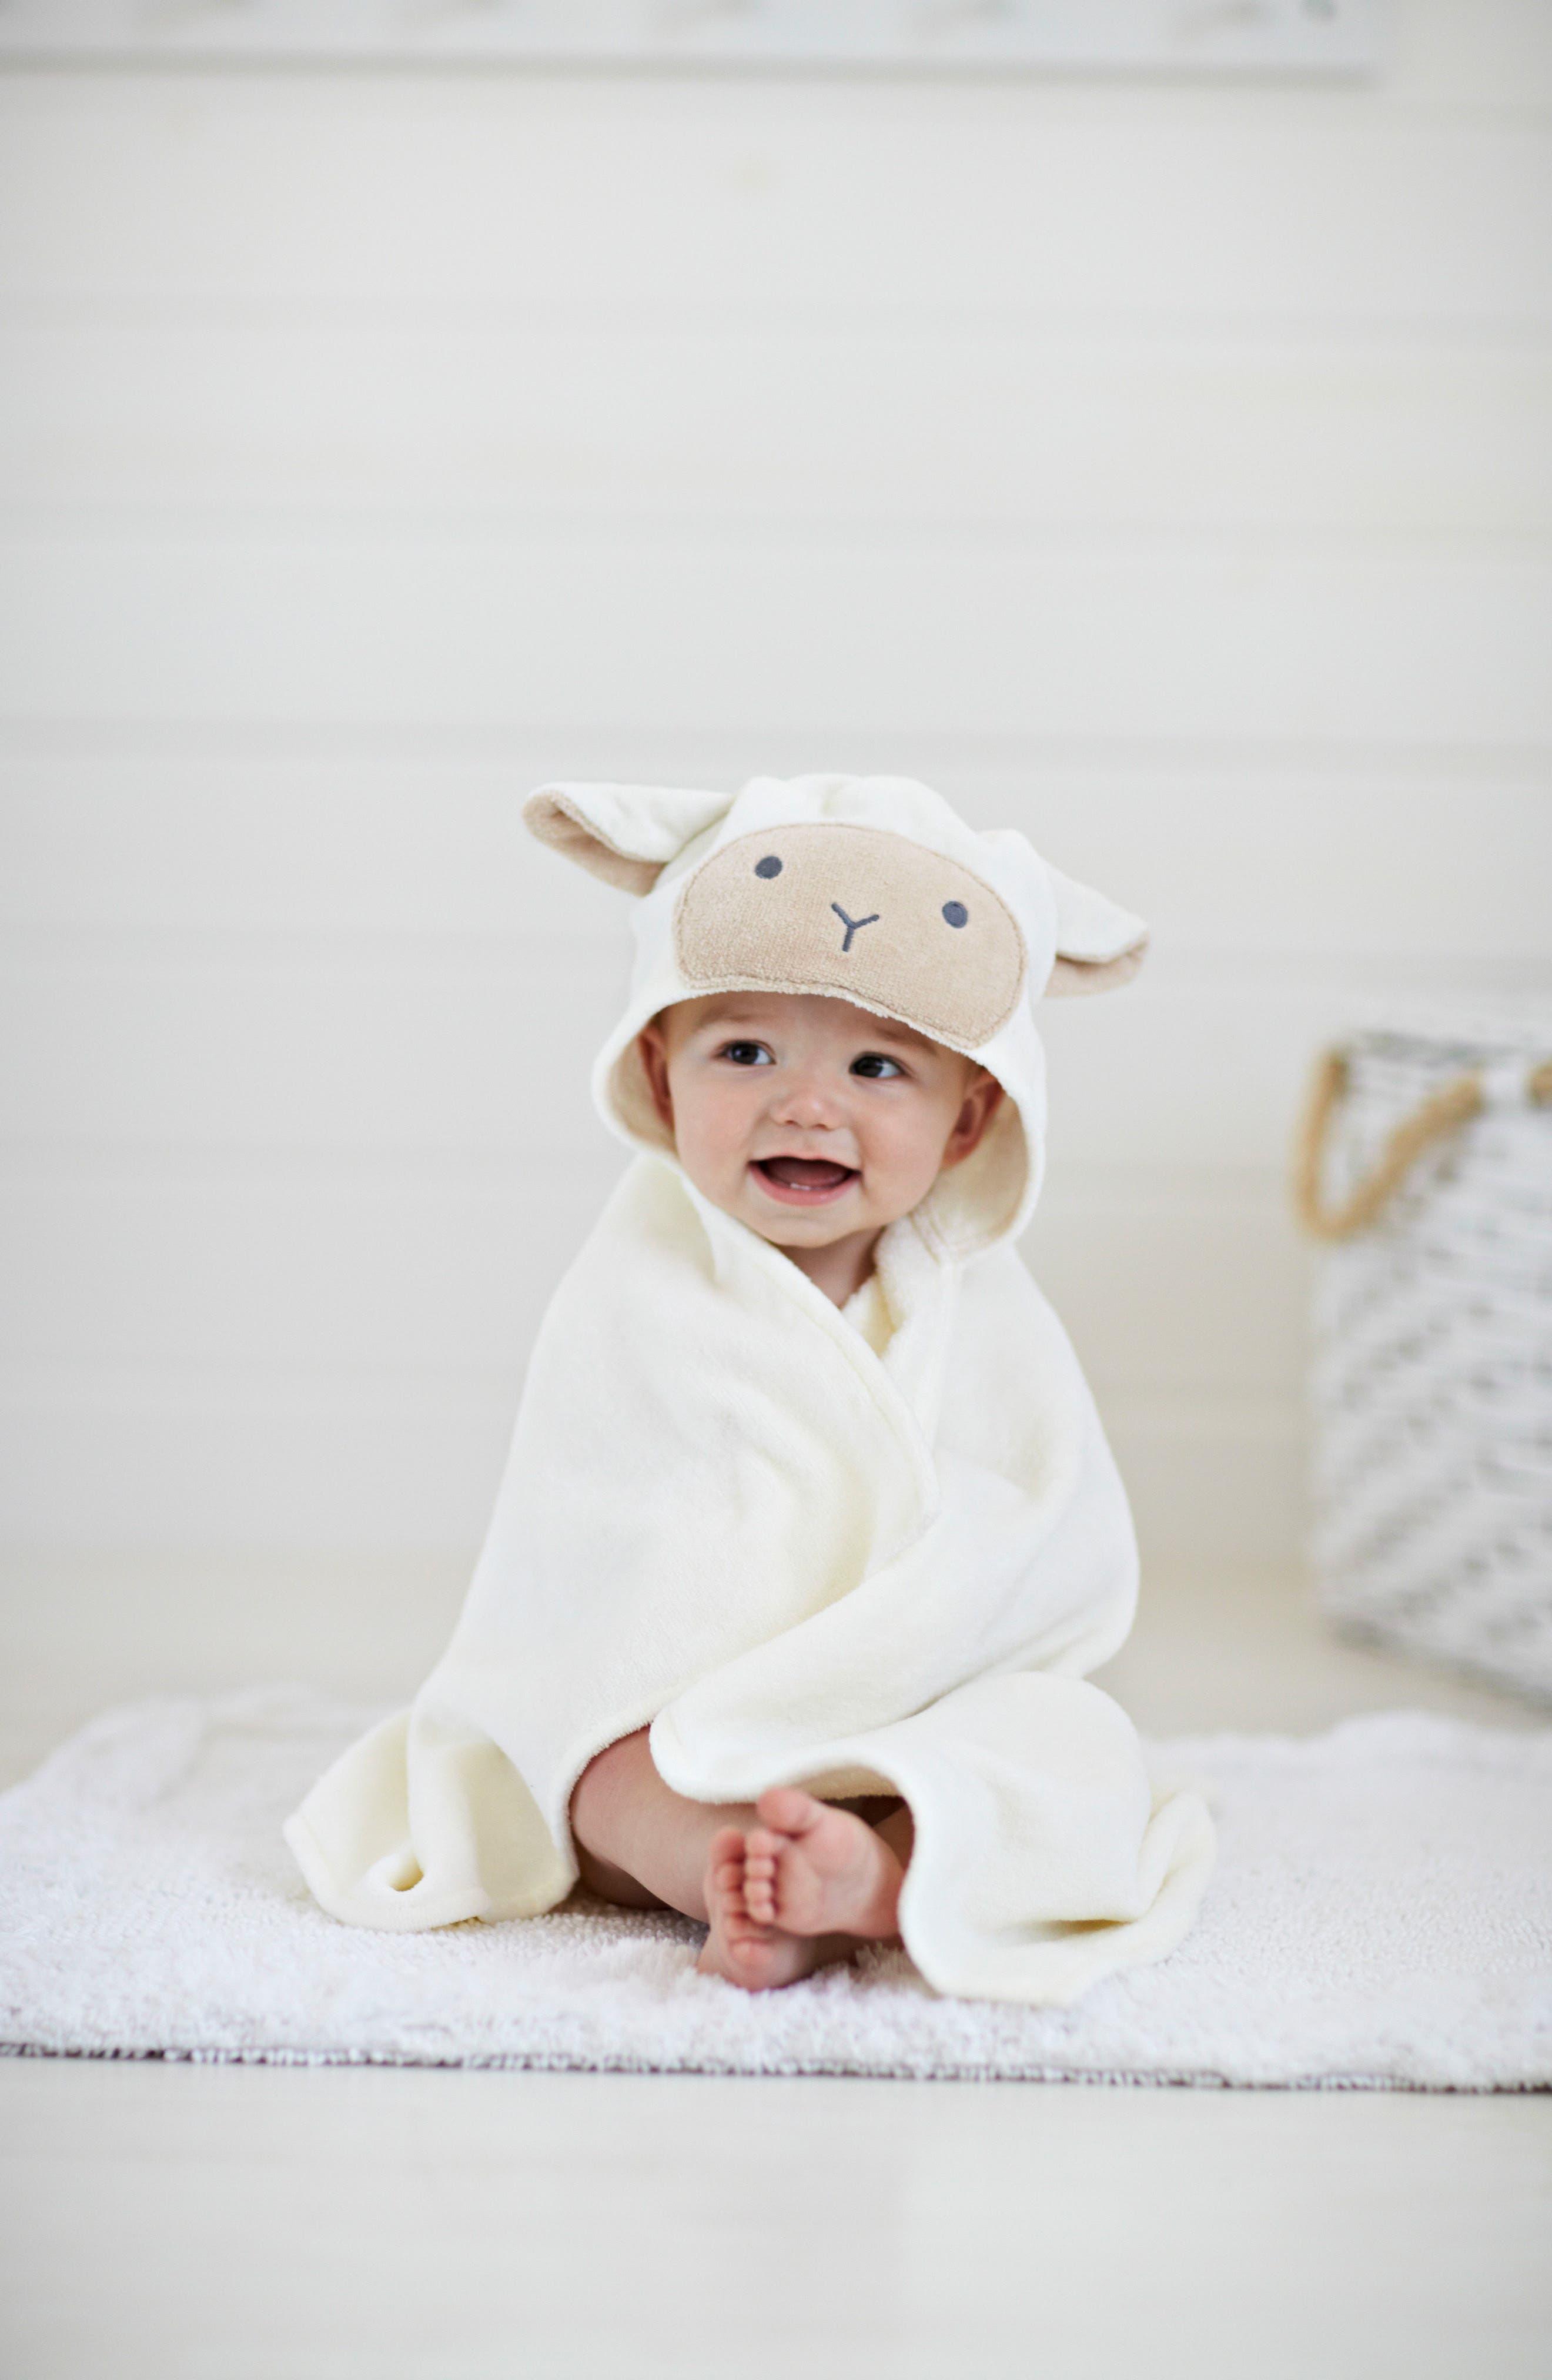 Terry Velour Hooded Lamb Towel,                             Alternate thumbnail 2, color,                             100